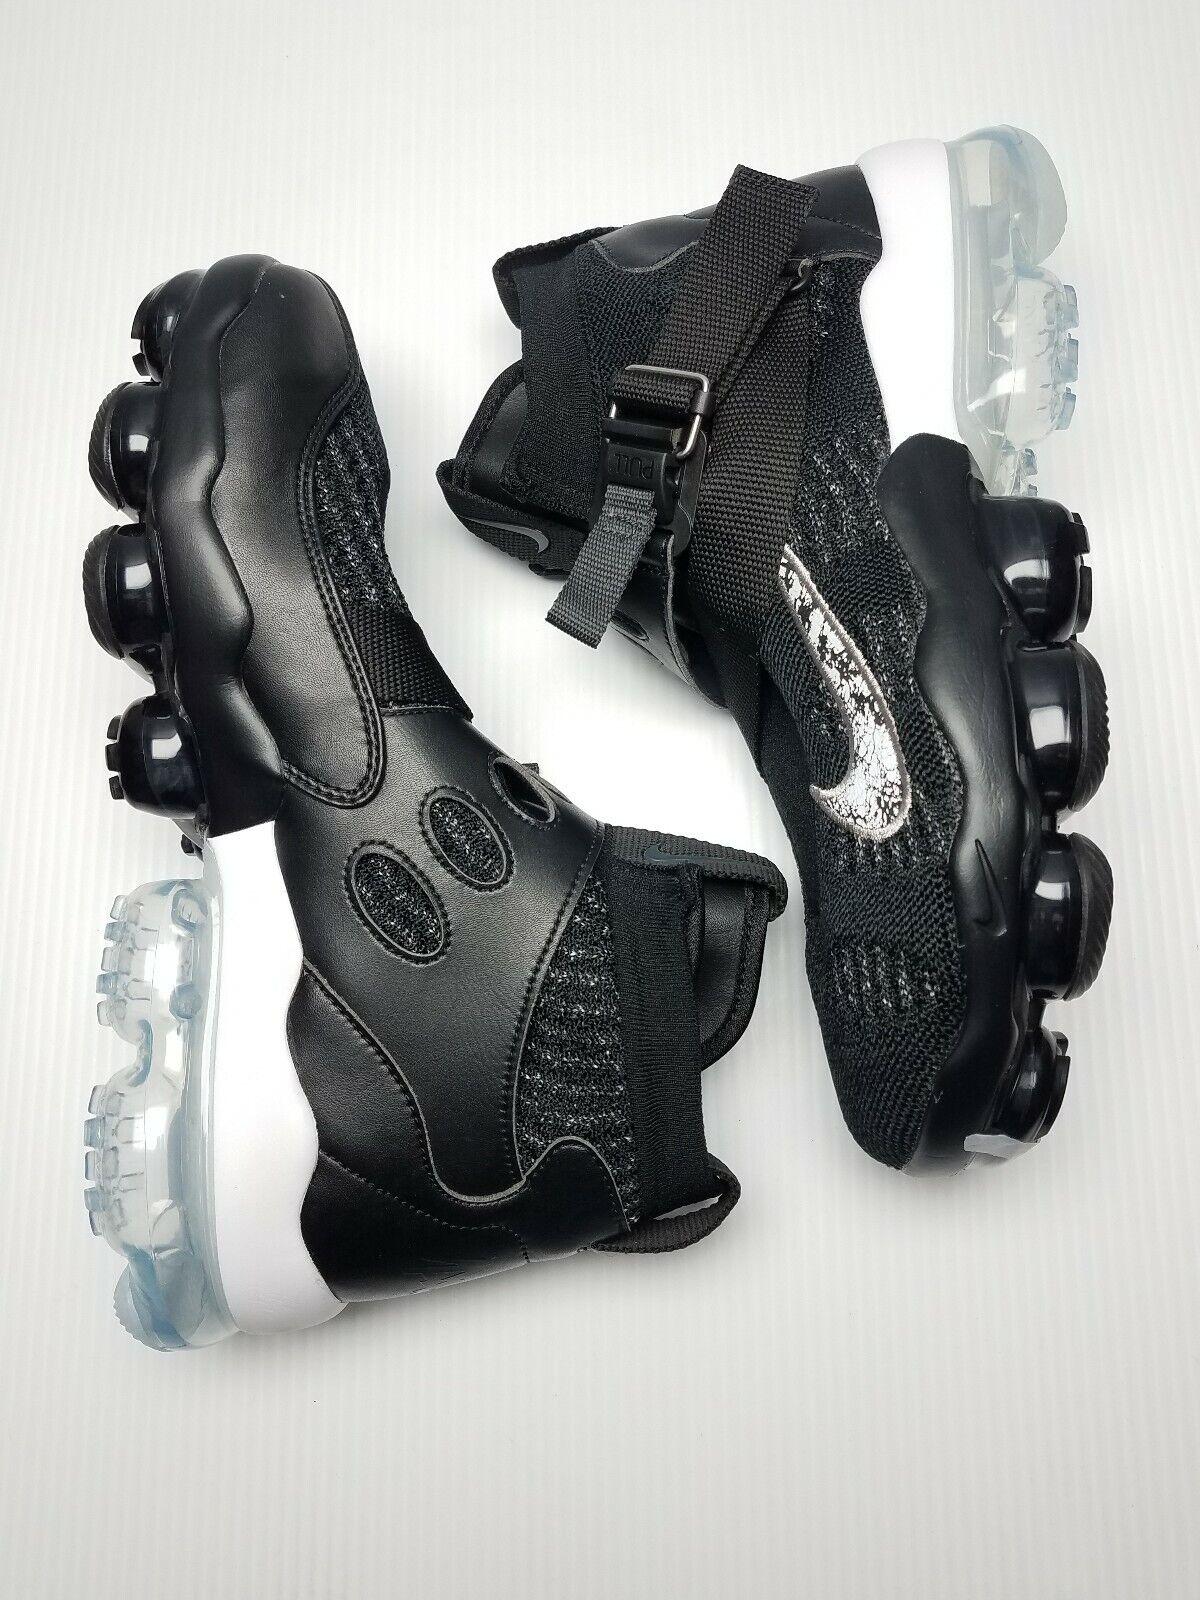 Nike Air Vapormax Premier Flyknit Black Metallic Silver AO3241-002 Size 9